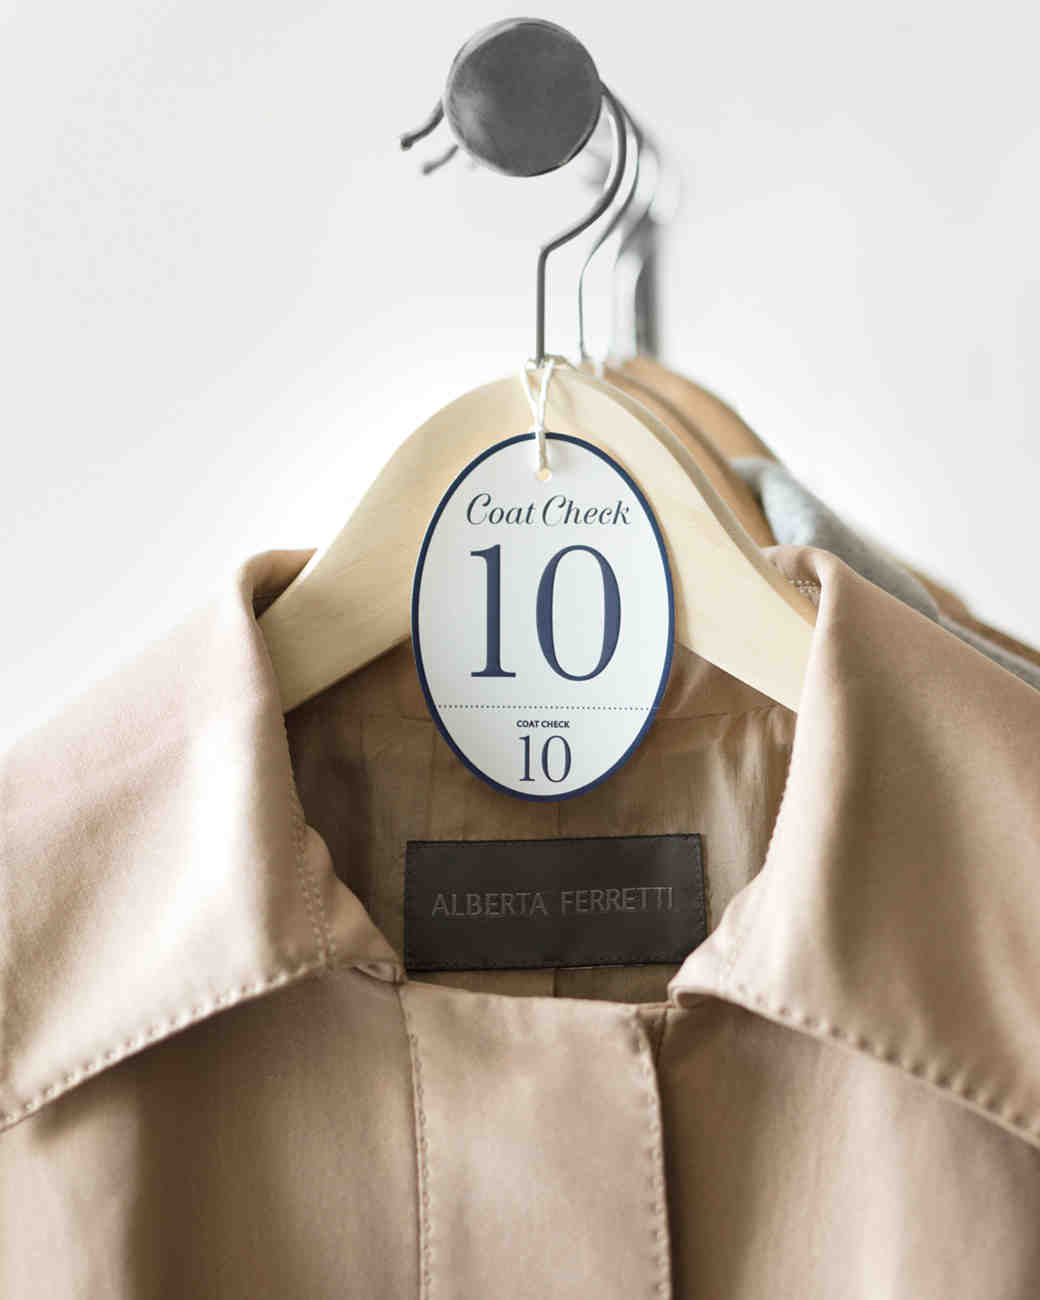 coat-check-gt-mwd107748.jpg